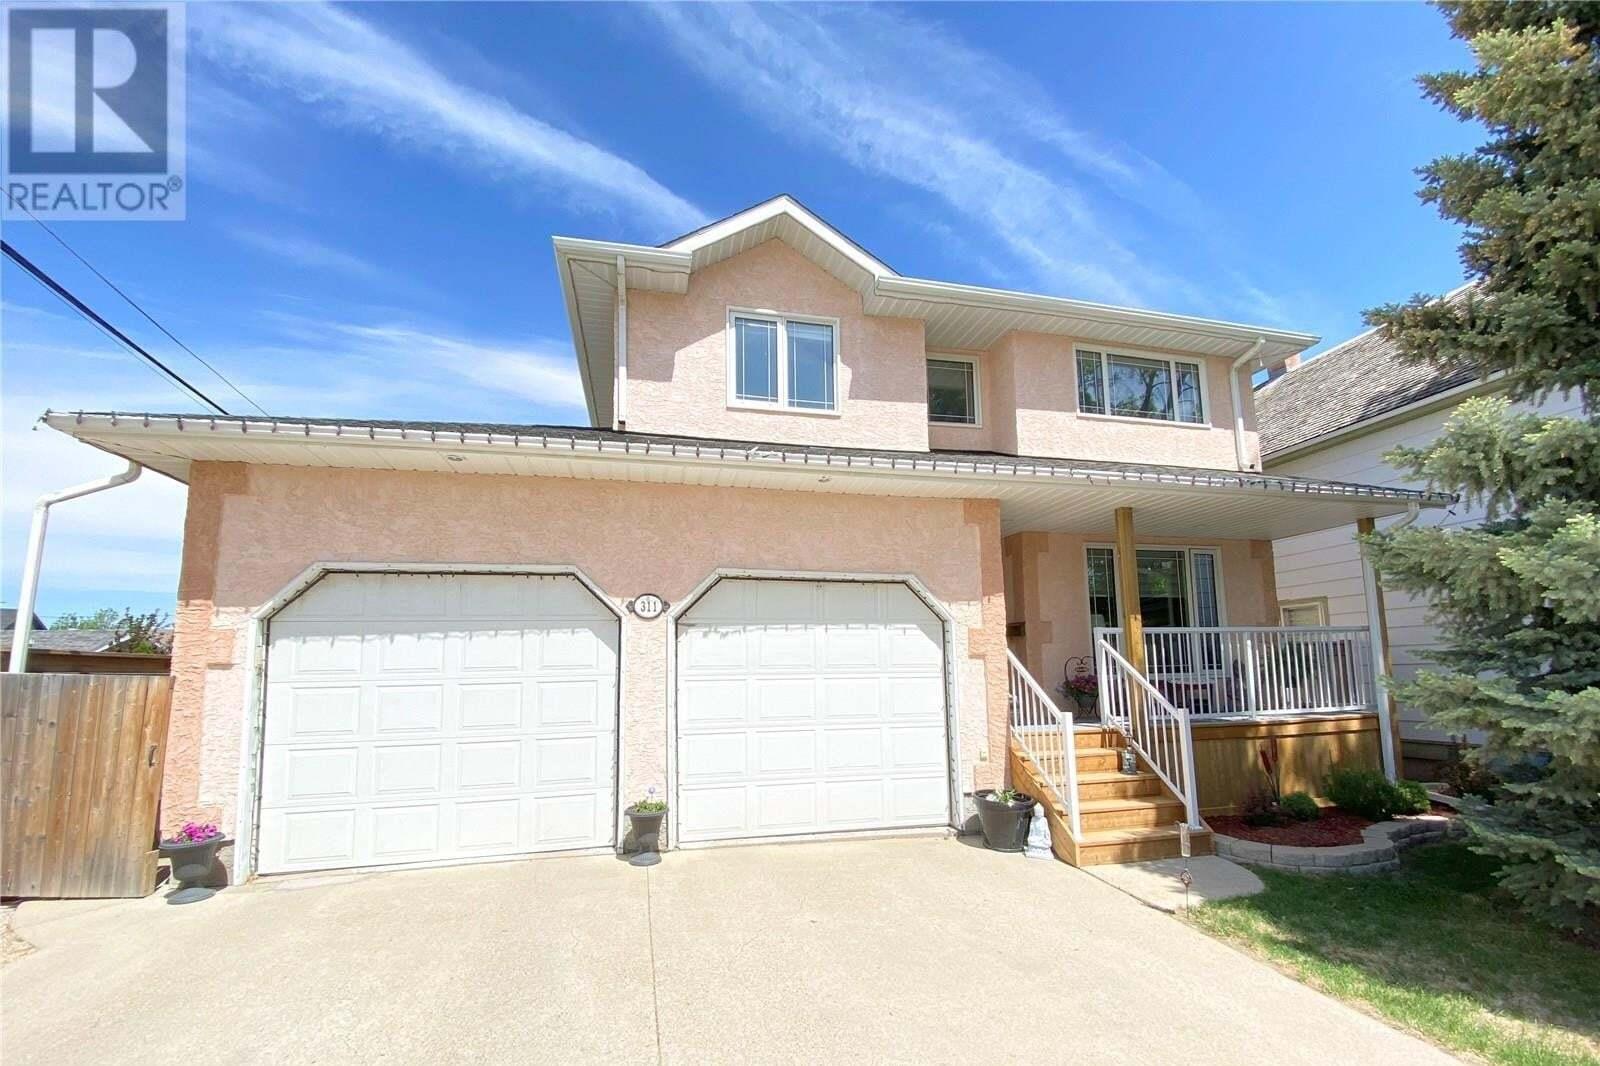 House for sale at 311 3rd Ave Weyburn Saskatchewan - MLS: SK811068